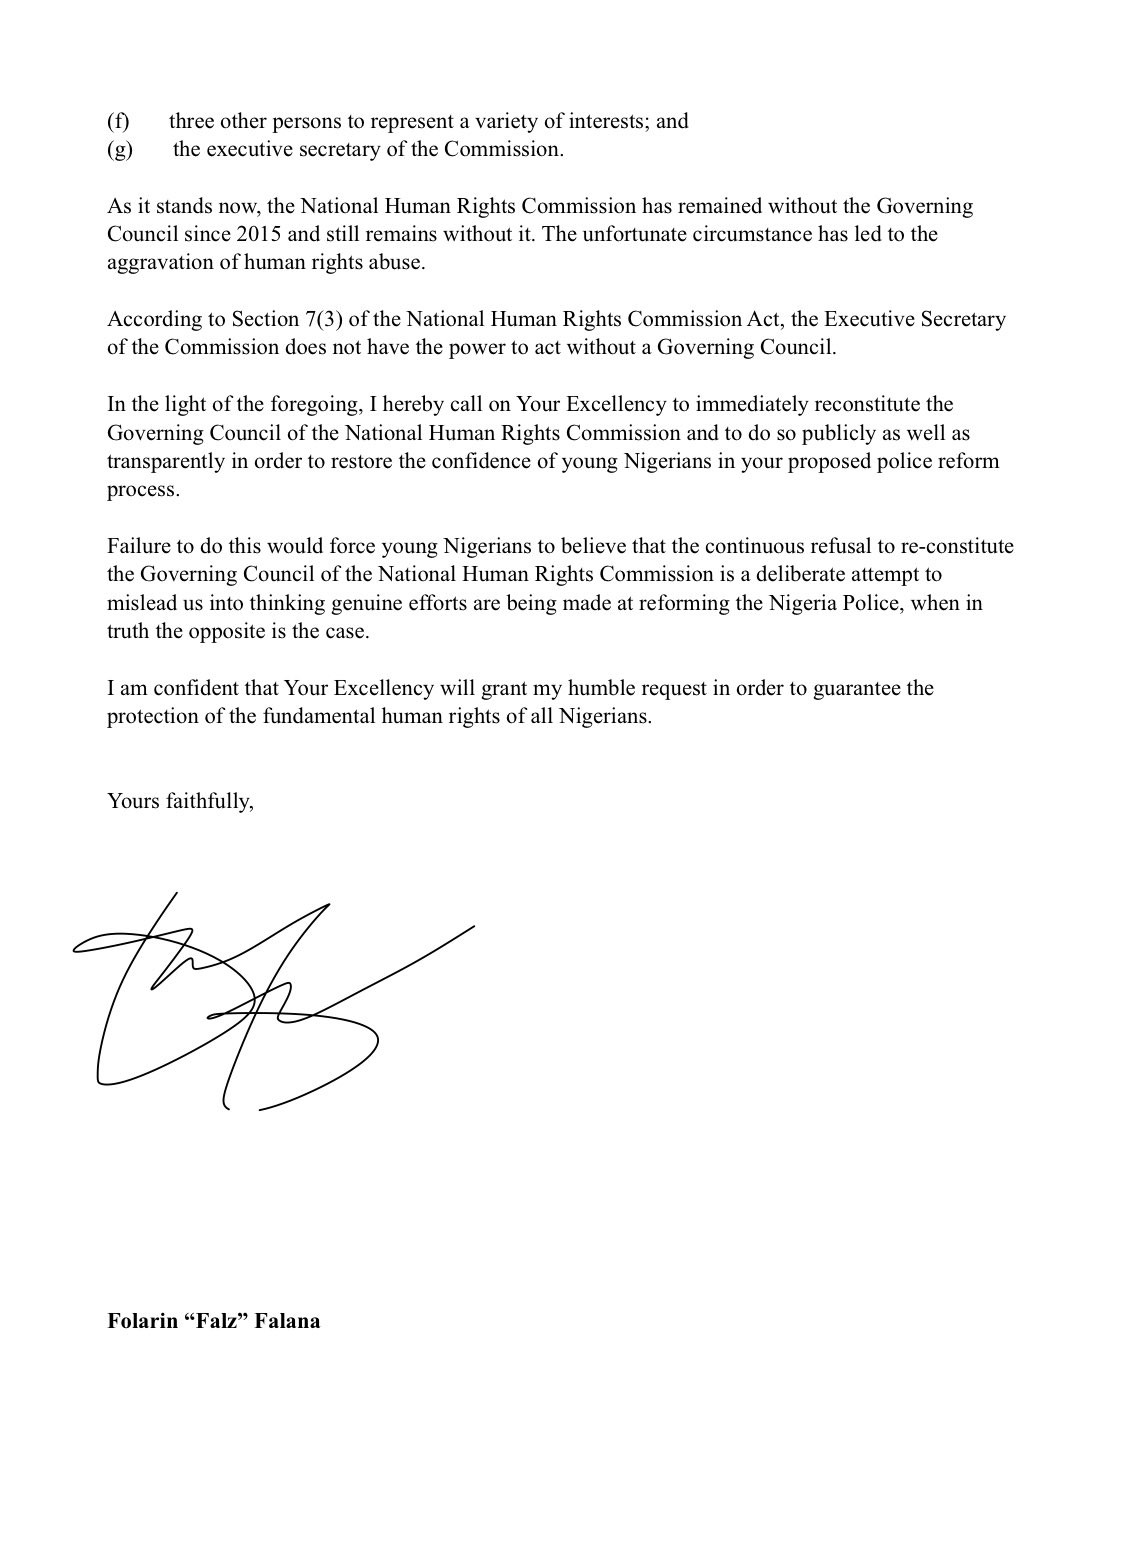 Falz writes letter